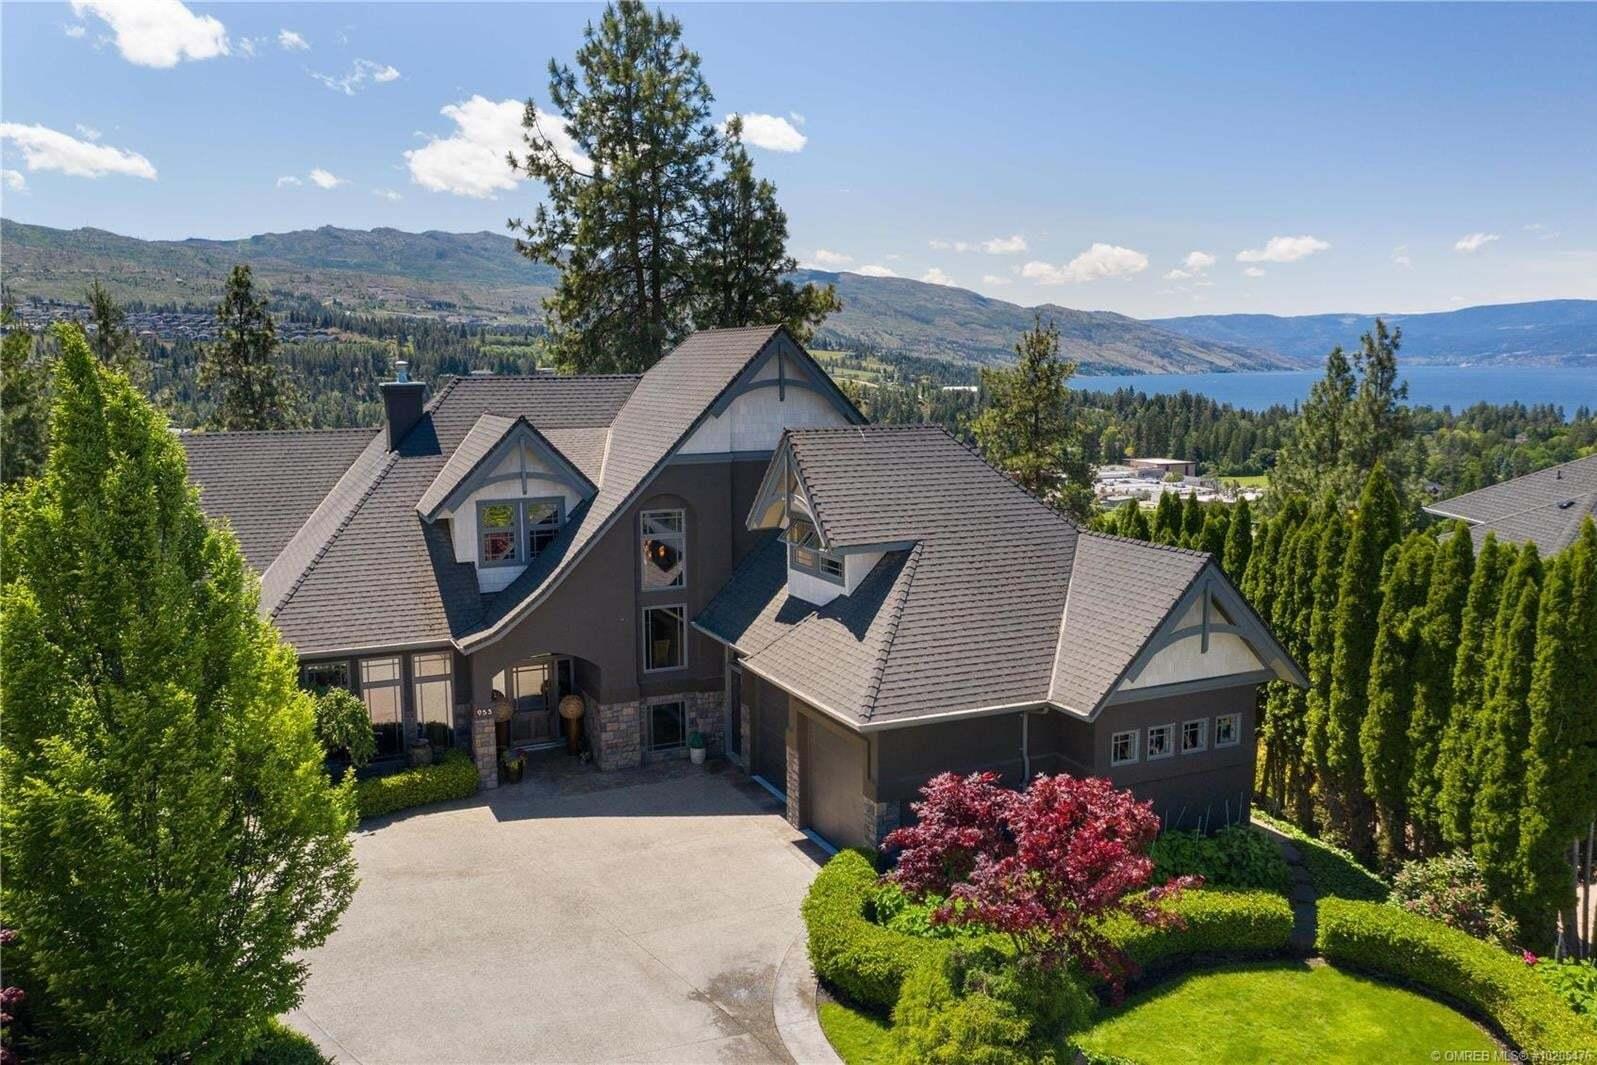 House for sale at 953 Westpoint Dr Kelowna British Columbia - MLS: 10205476